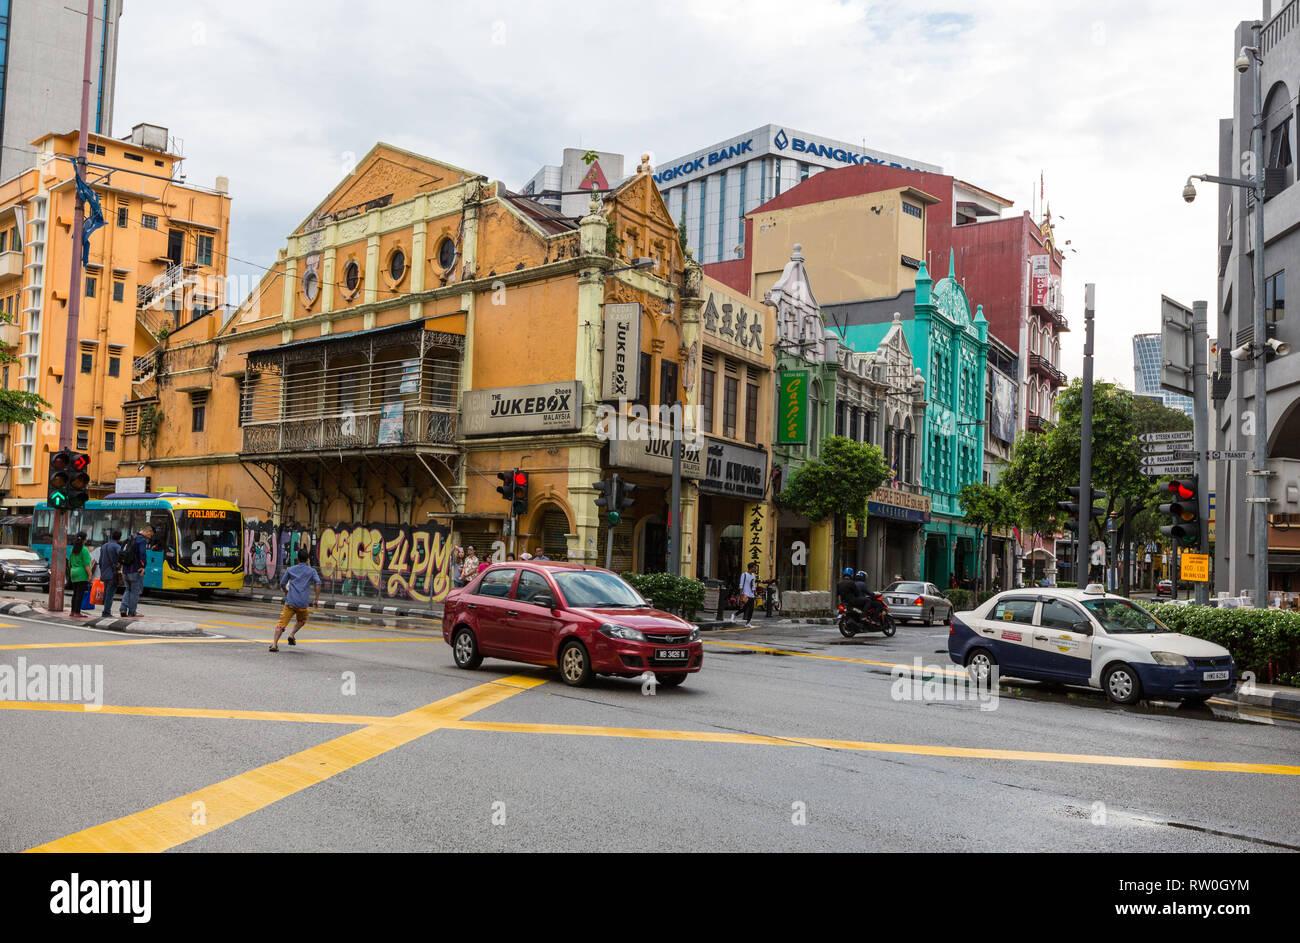 Shophouses, Early Twentieth century, Kuala Lumpur, Malaysia. - Stock Image